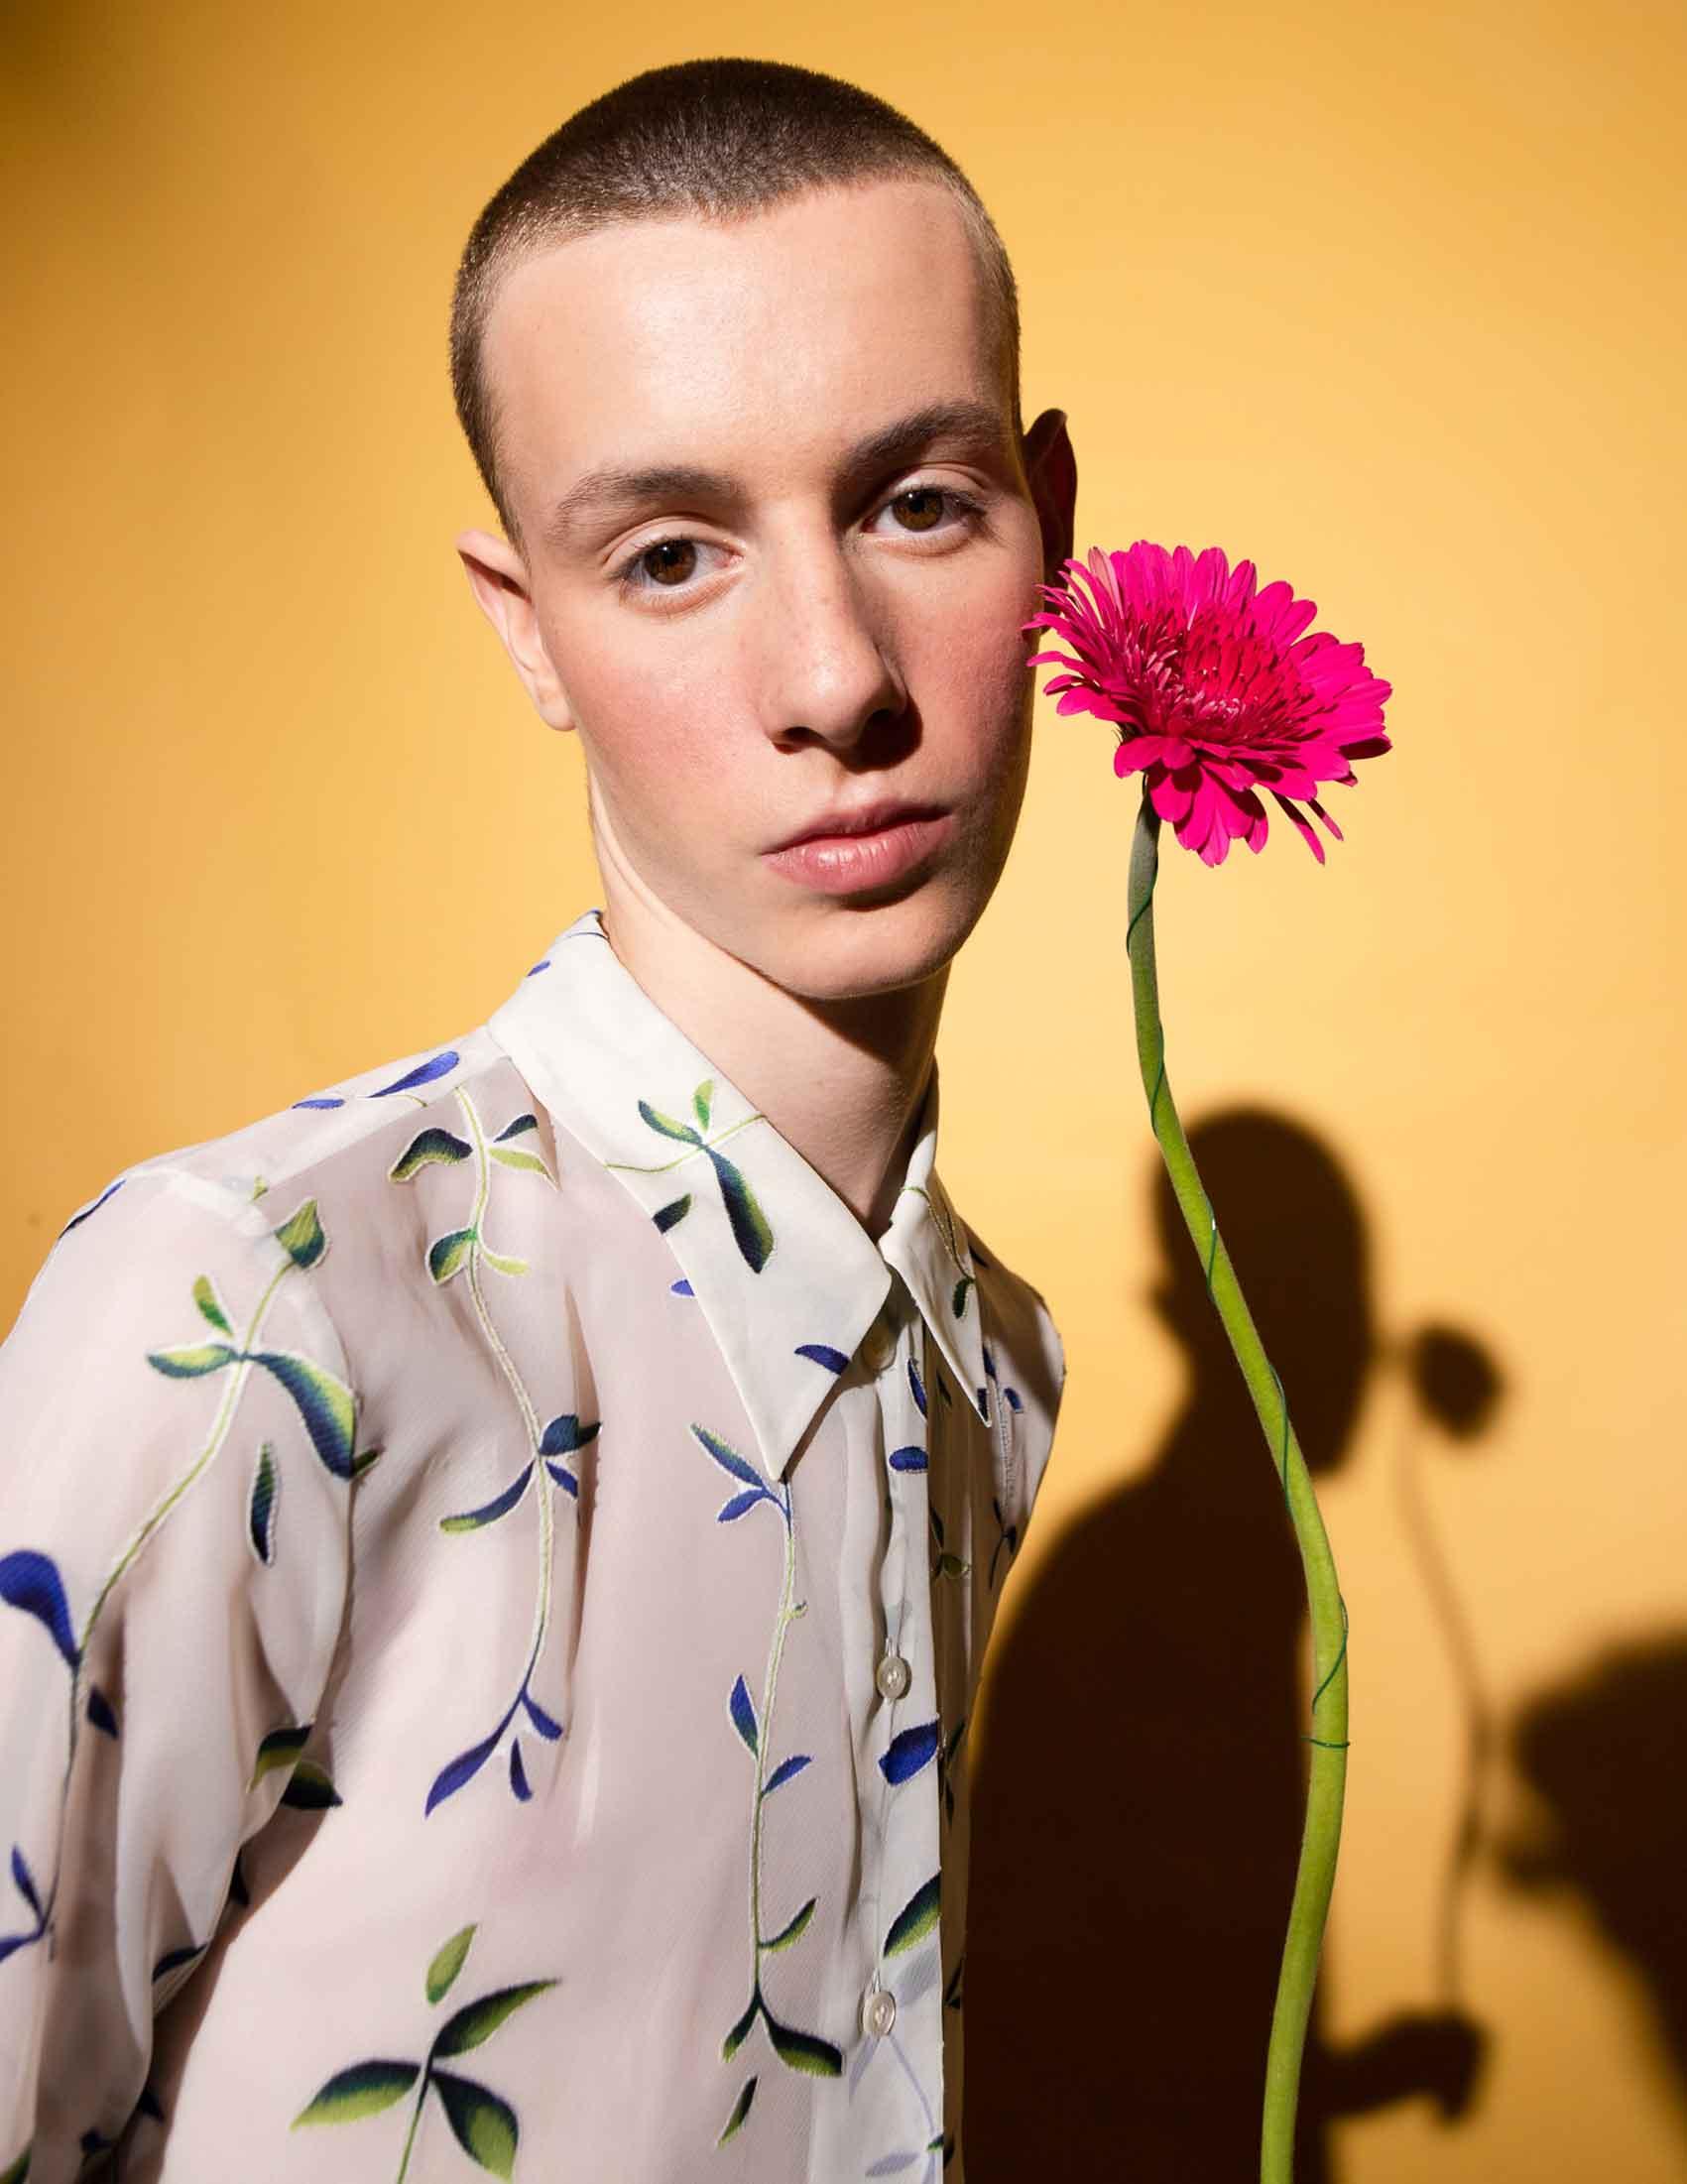 Photographer: Daniel Noy Dor Model: Idan Marin Stylist: Maayan Naftali Makeup: Roni Ben Ami Assistant: Tomer Hershkovitz12